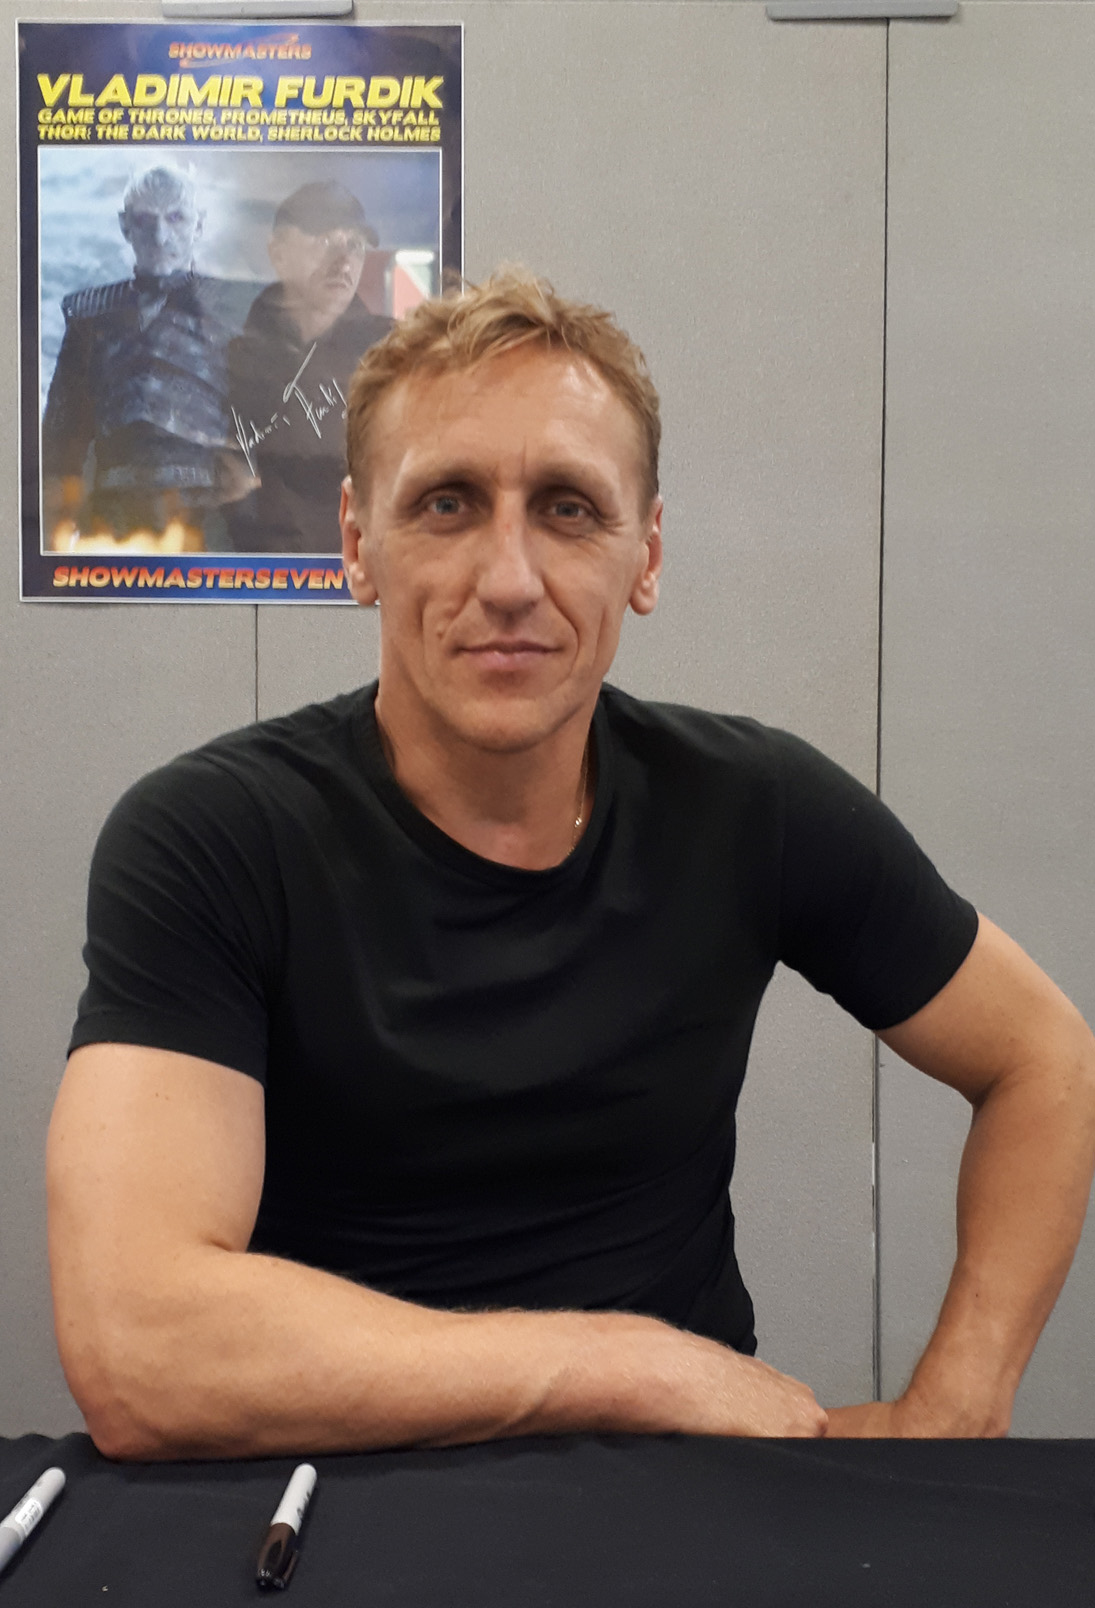 Vladimír Furdík